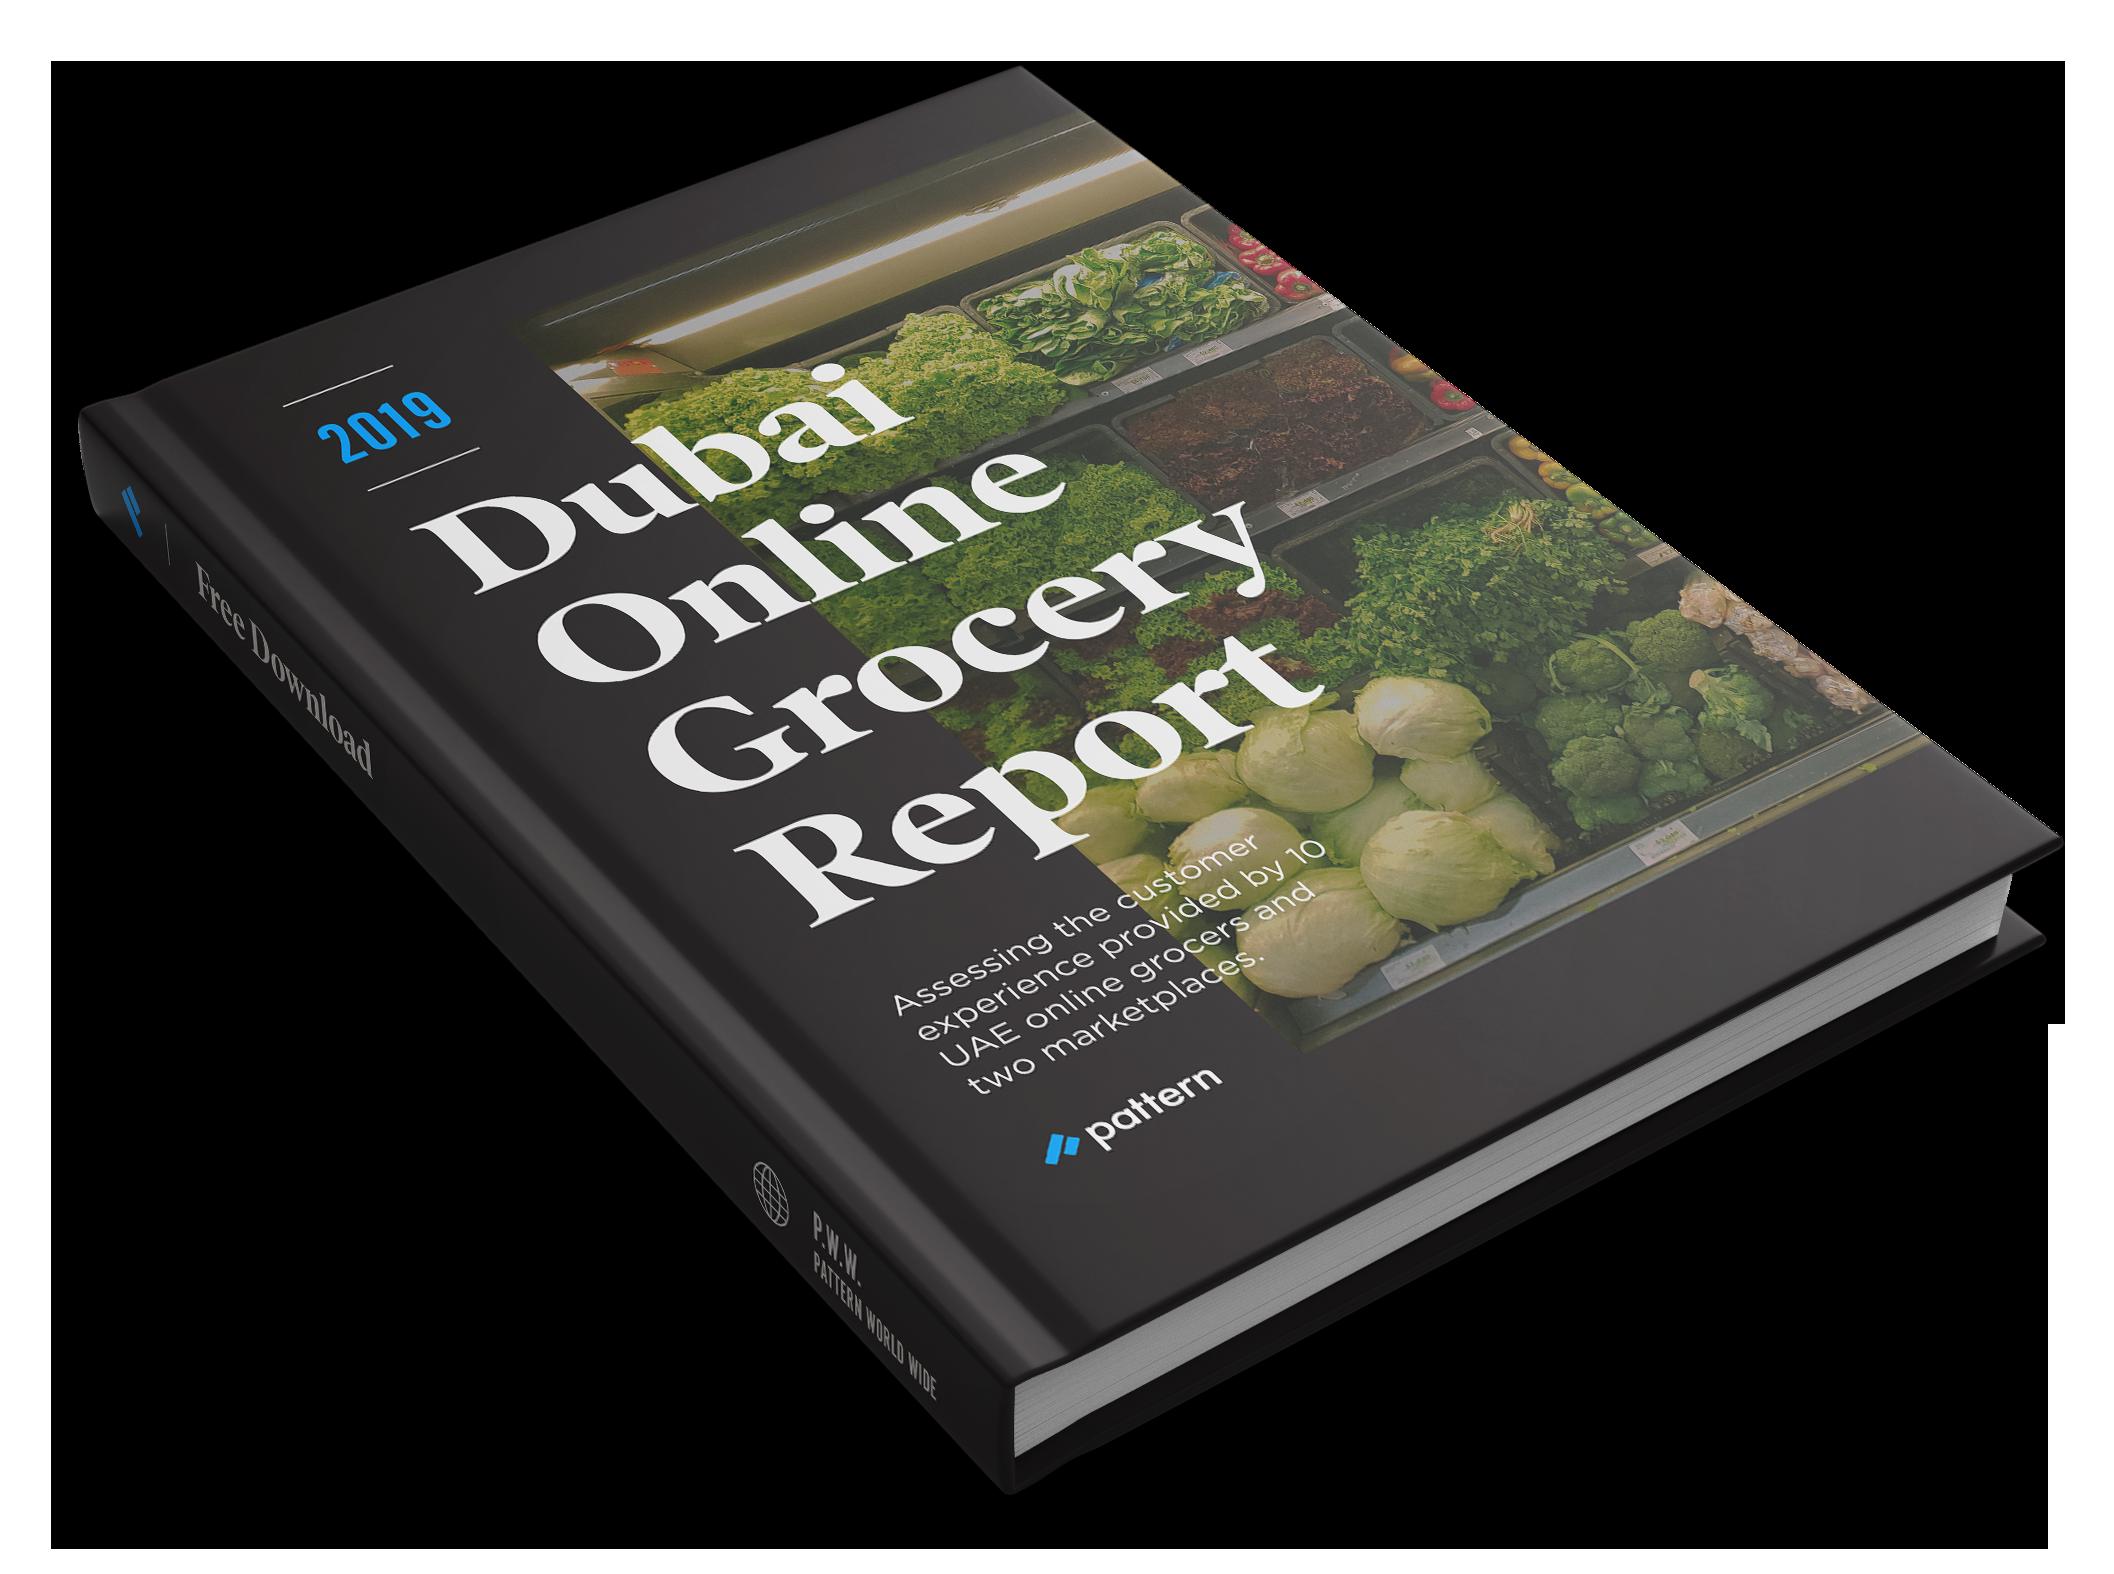 Dubai Online Grocery Report 2019